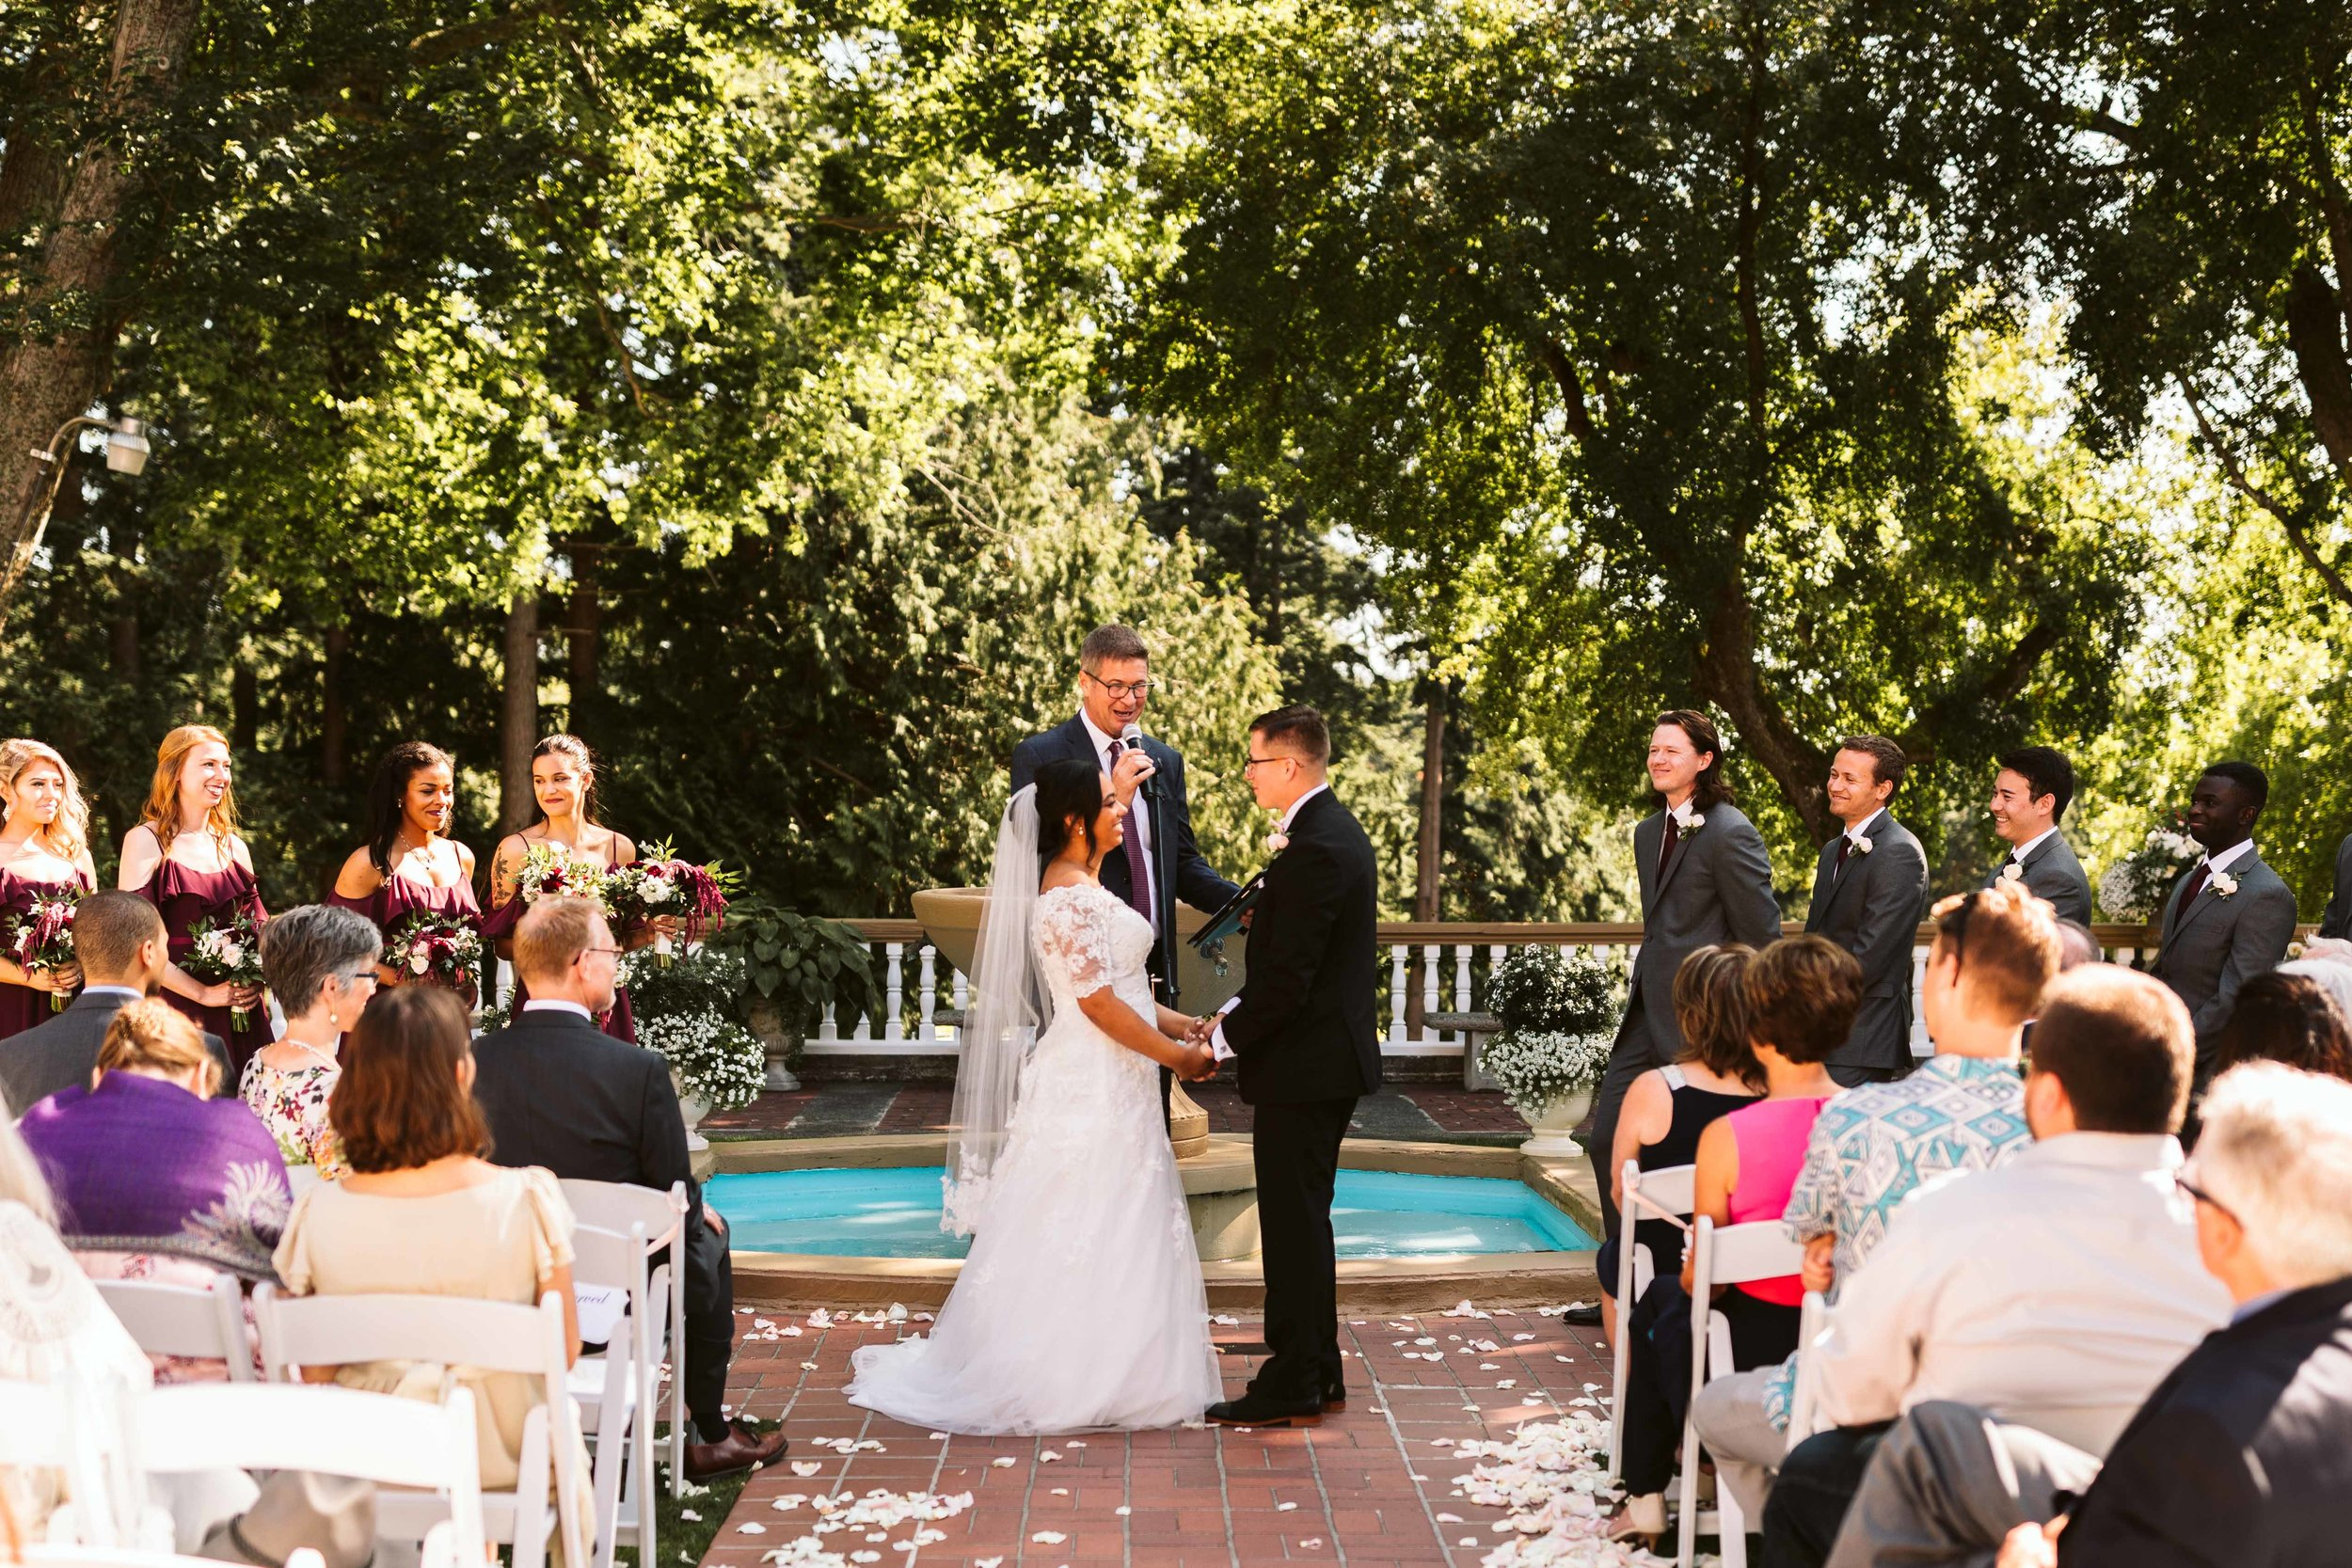 lairmont-manor-wedding-60.jpg